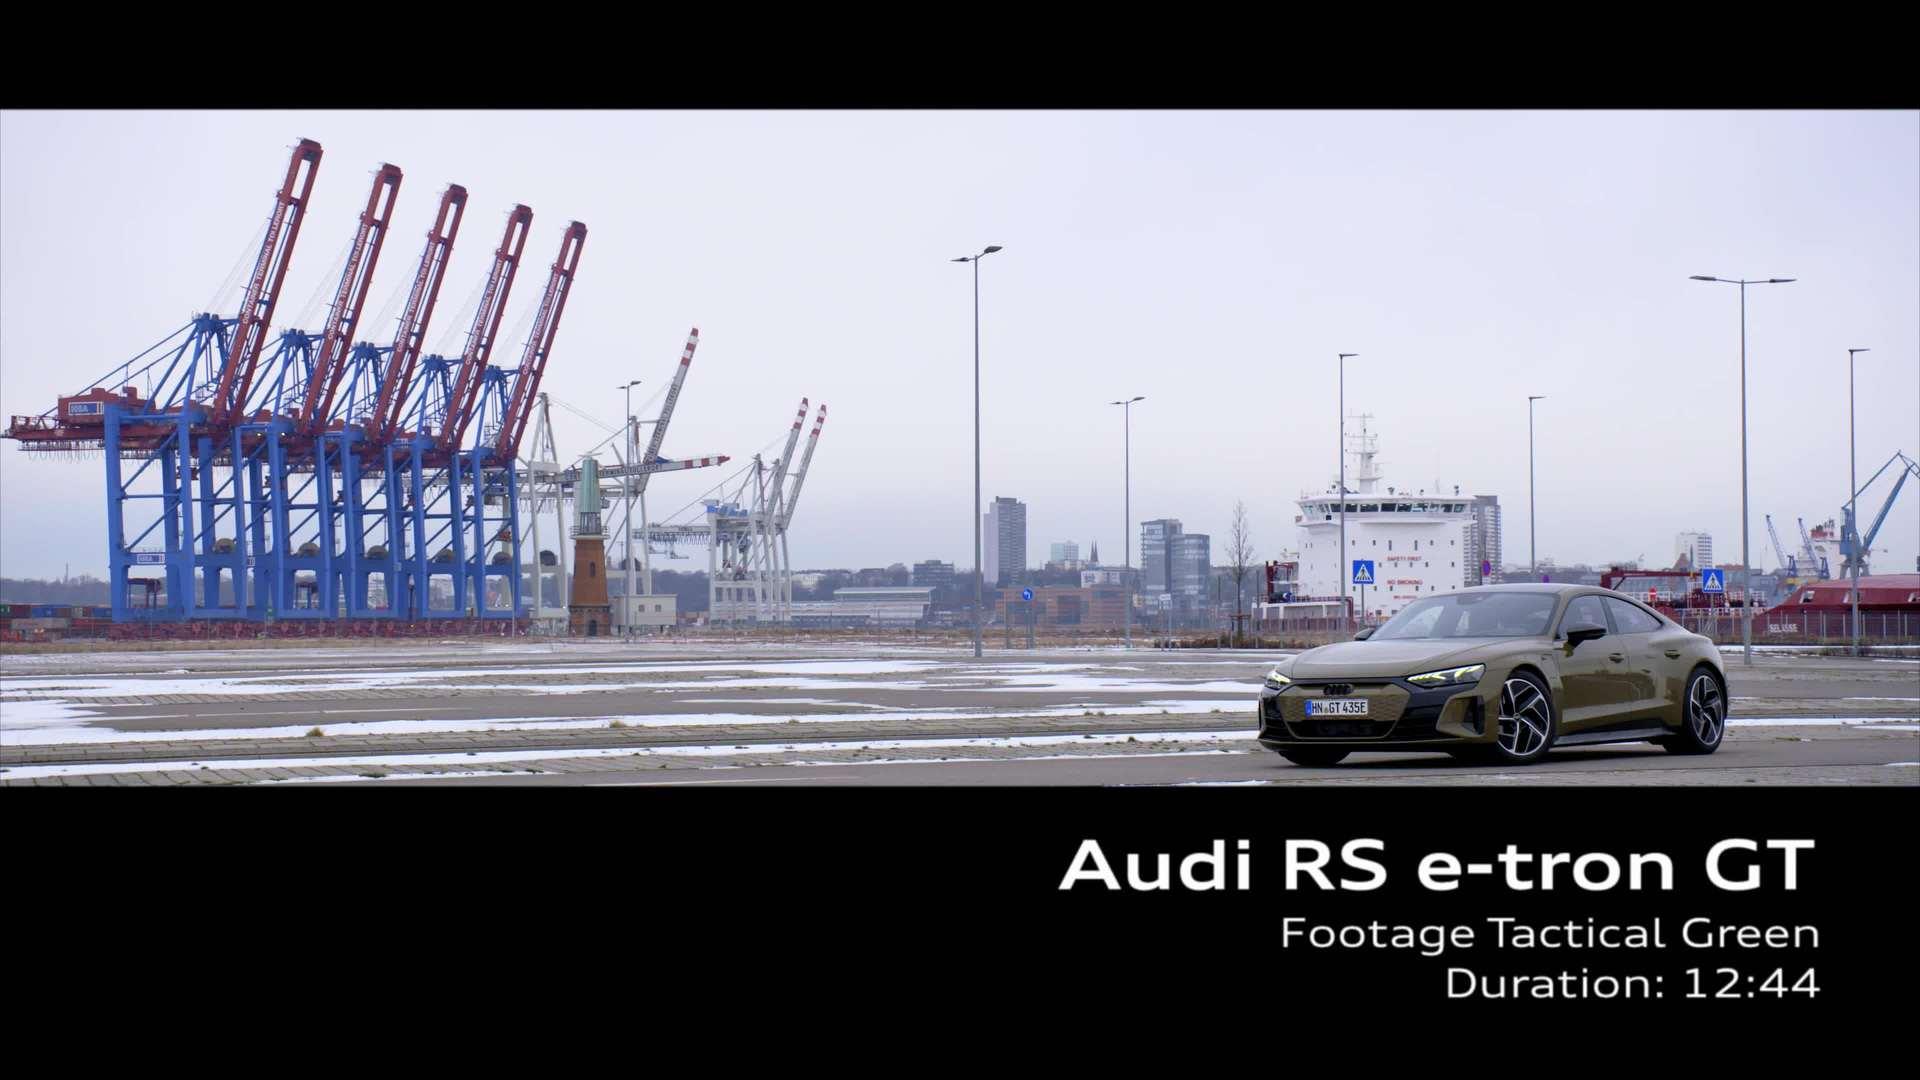 Footage: Audi RS e-tron GT Taktikgrün